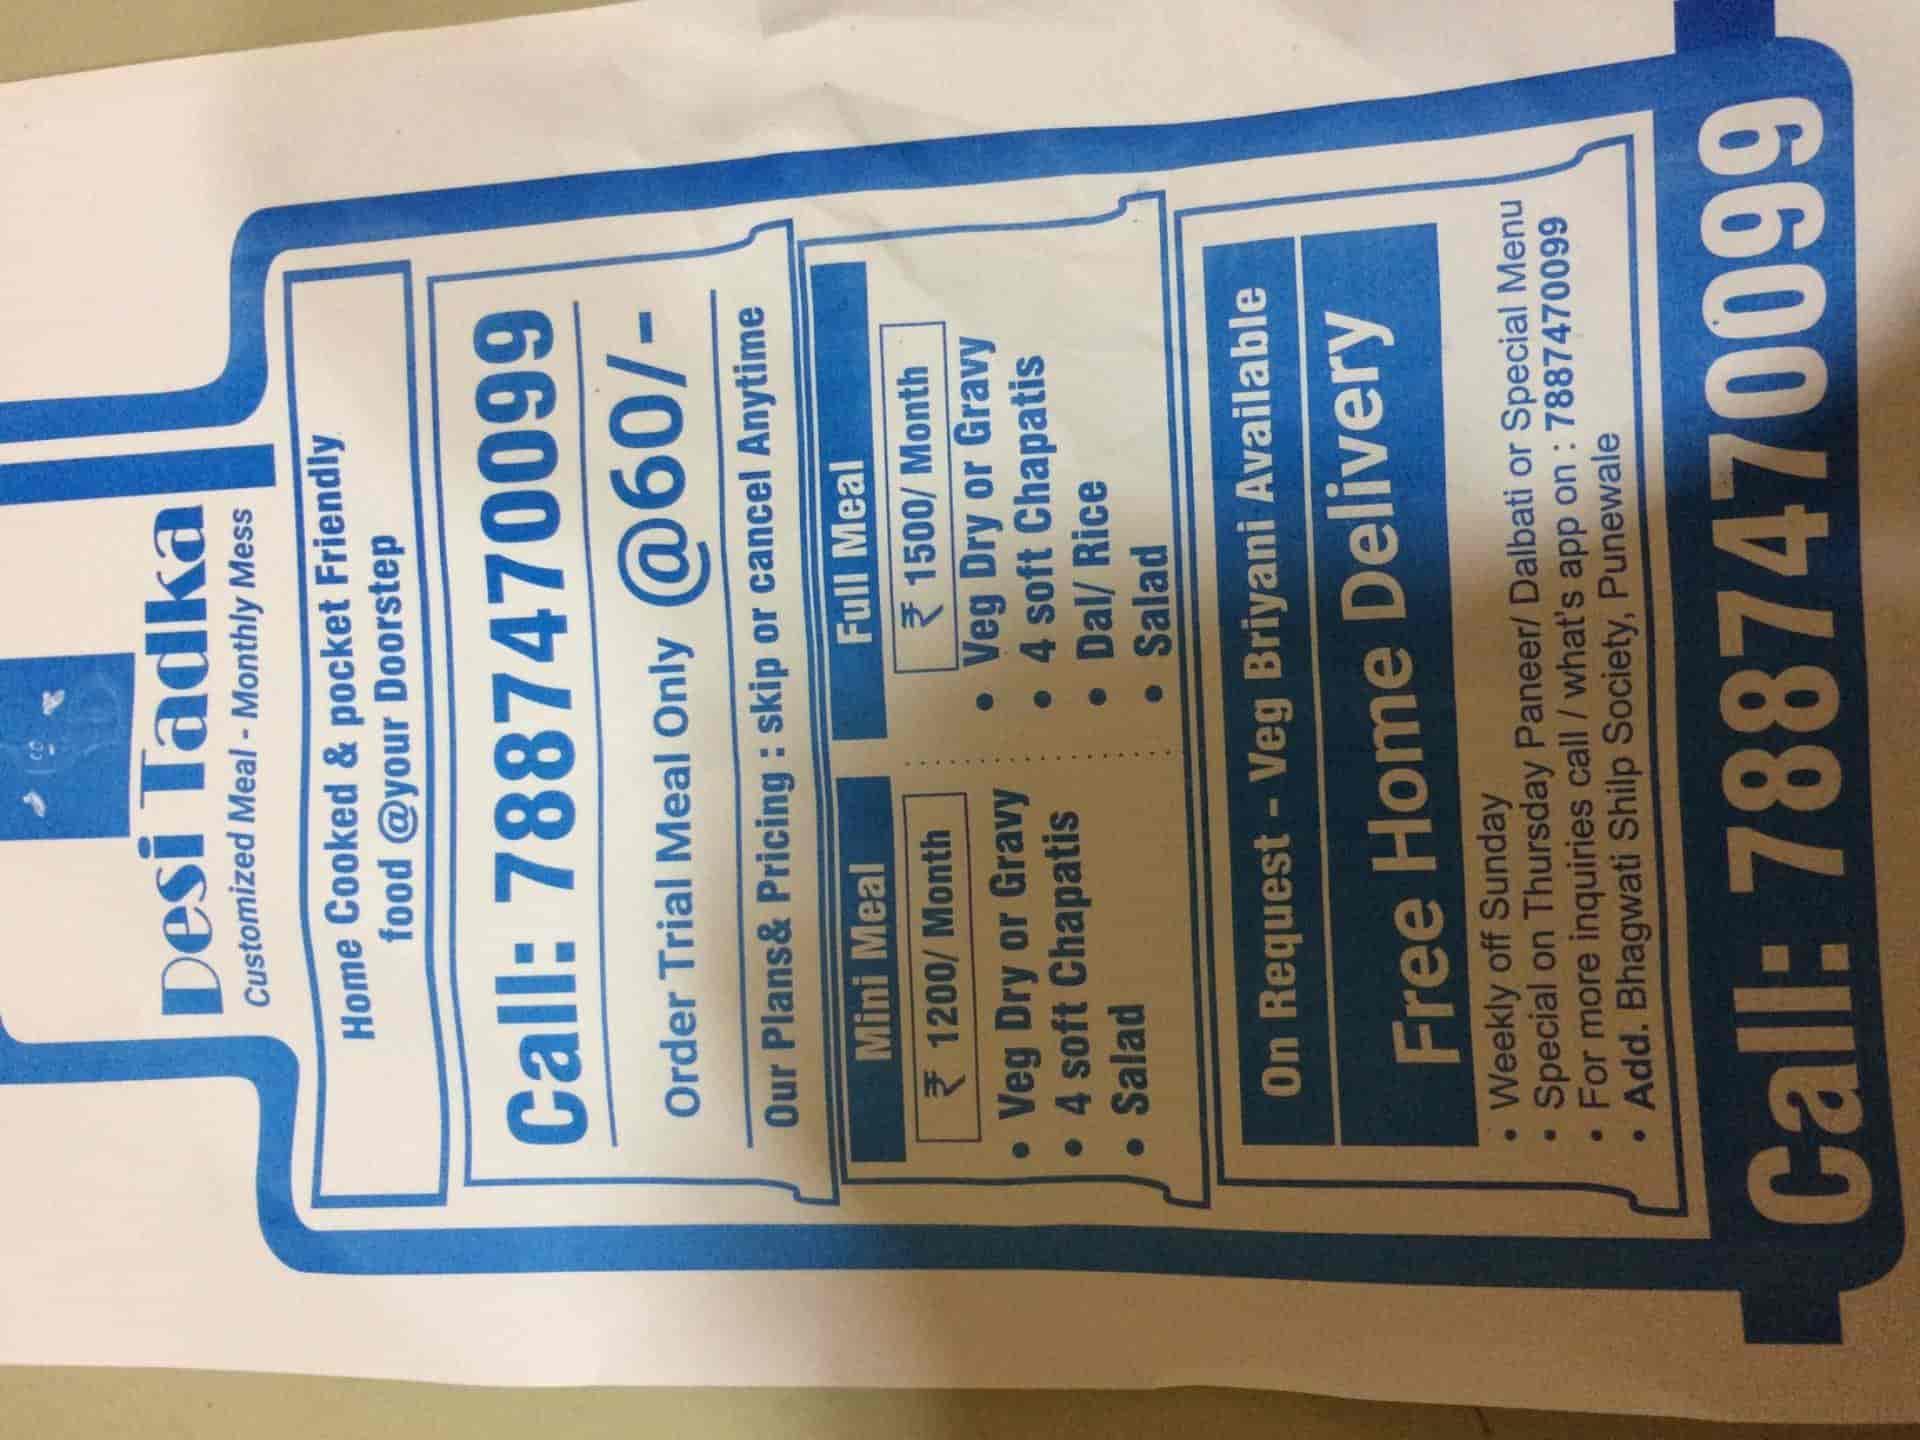 Free desi phone label template